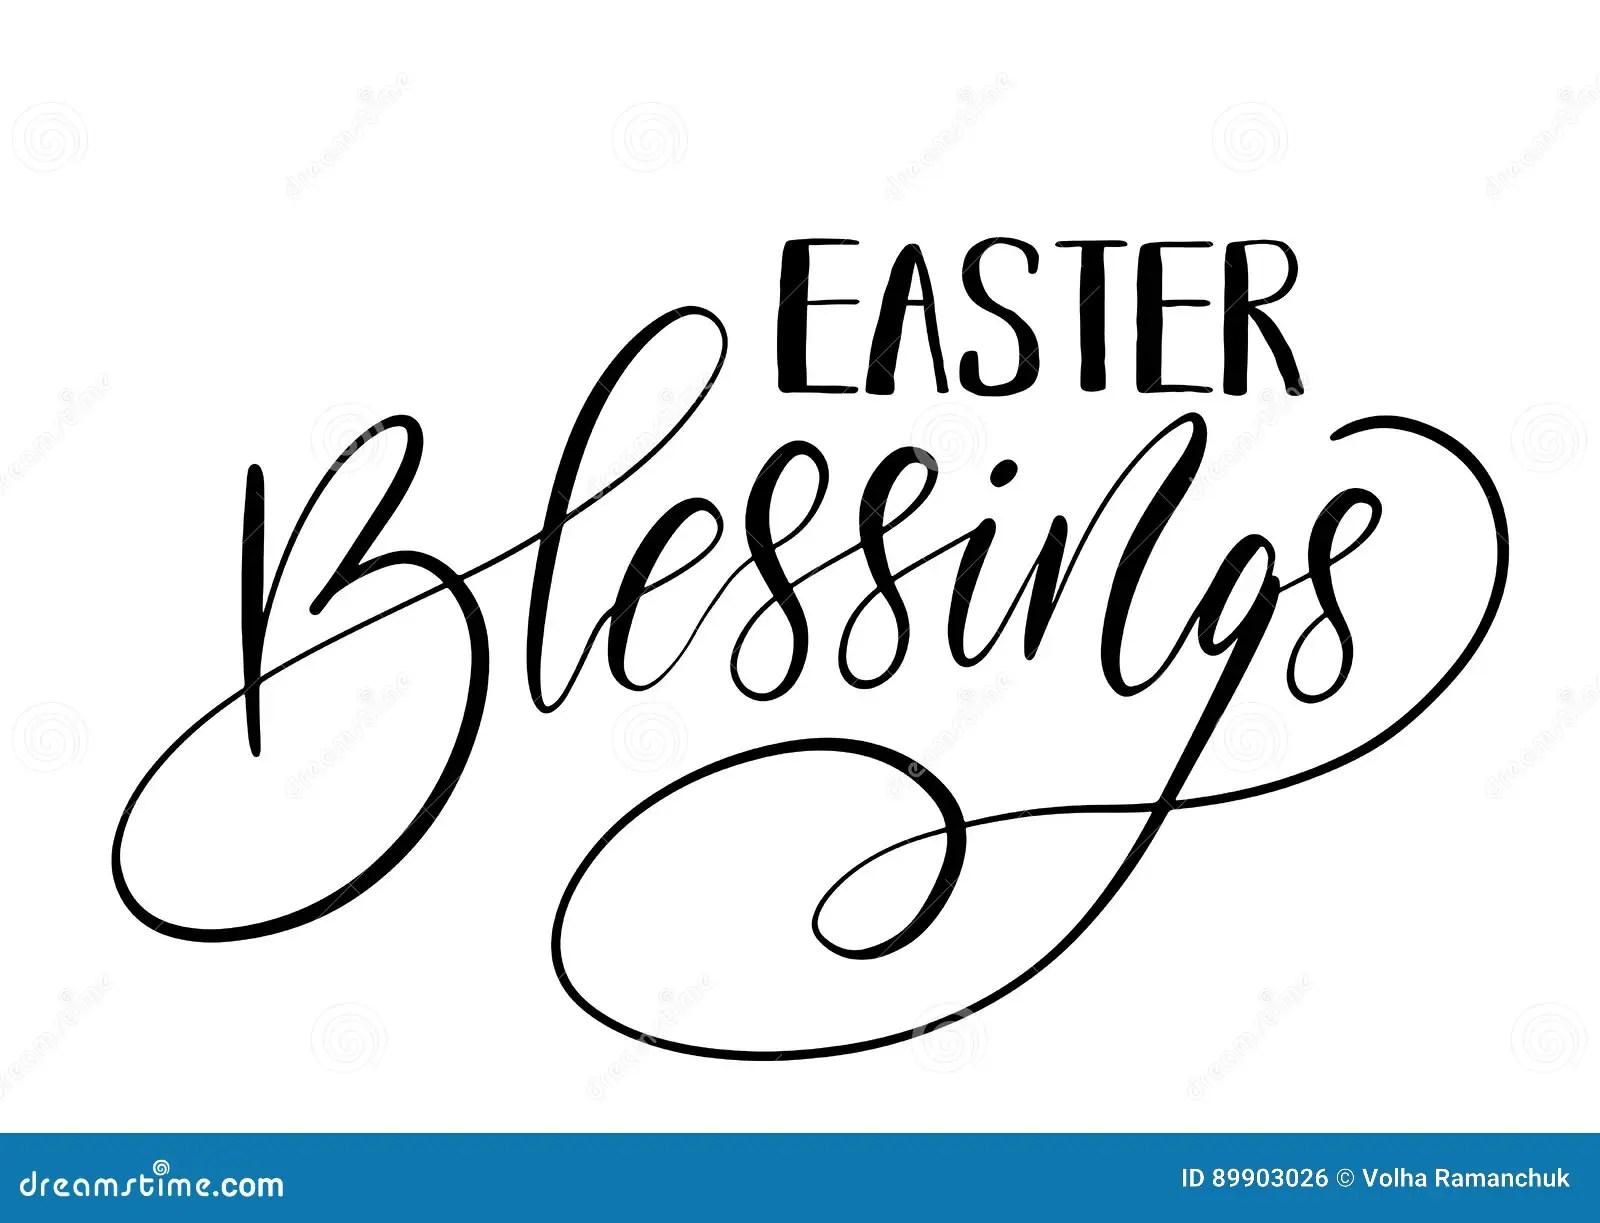 Easter Holiday Celebration Easter Blessings Handwriting